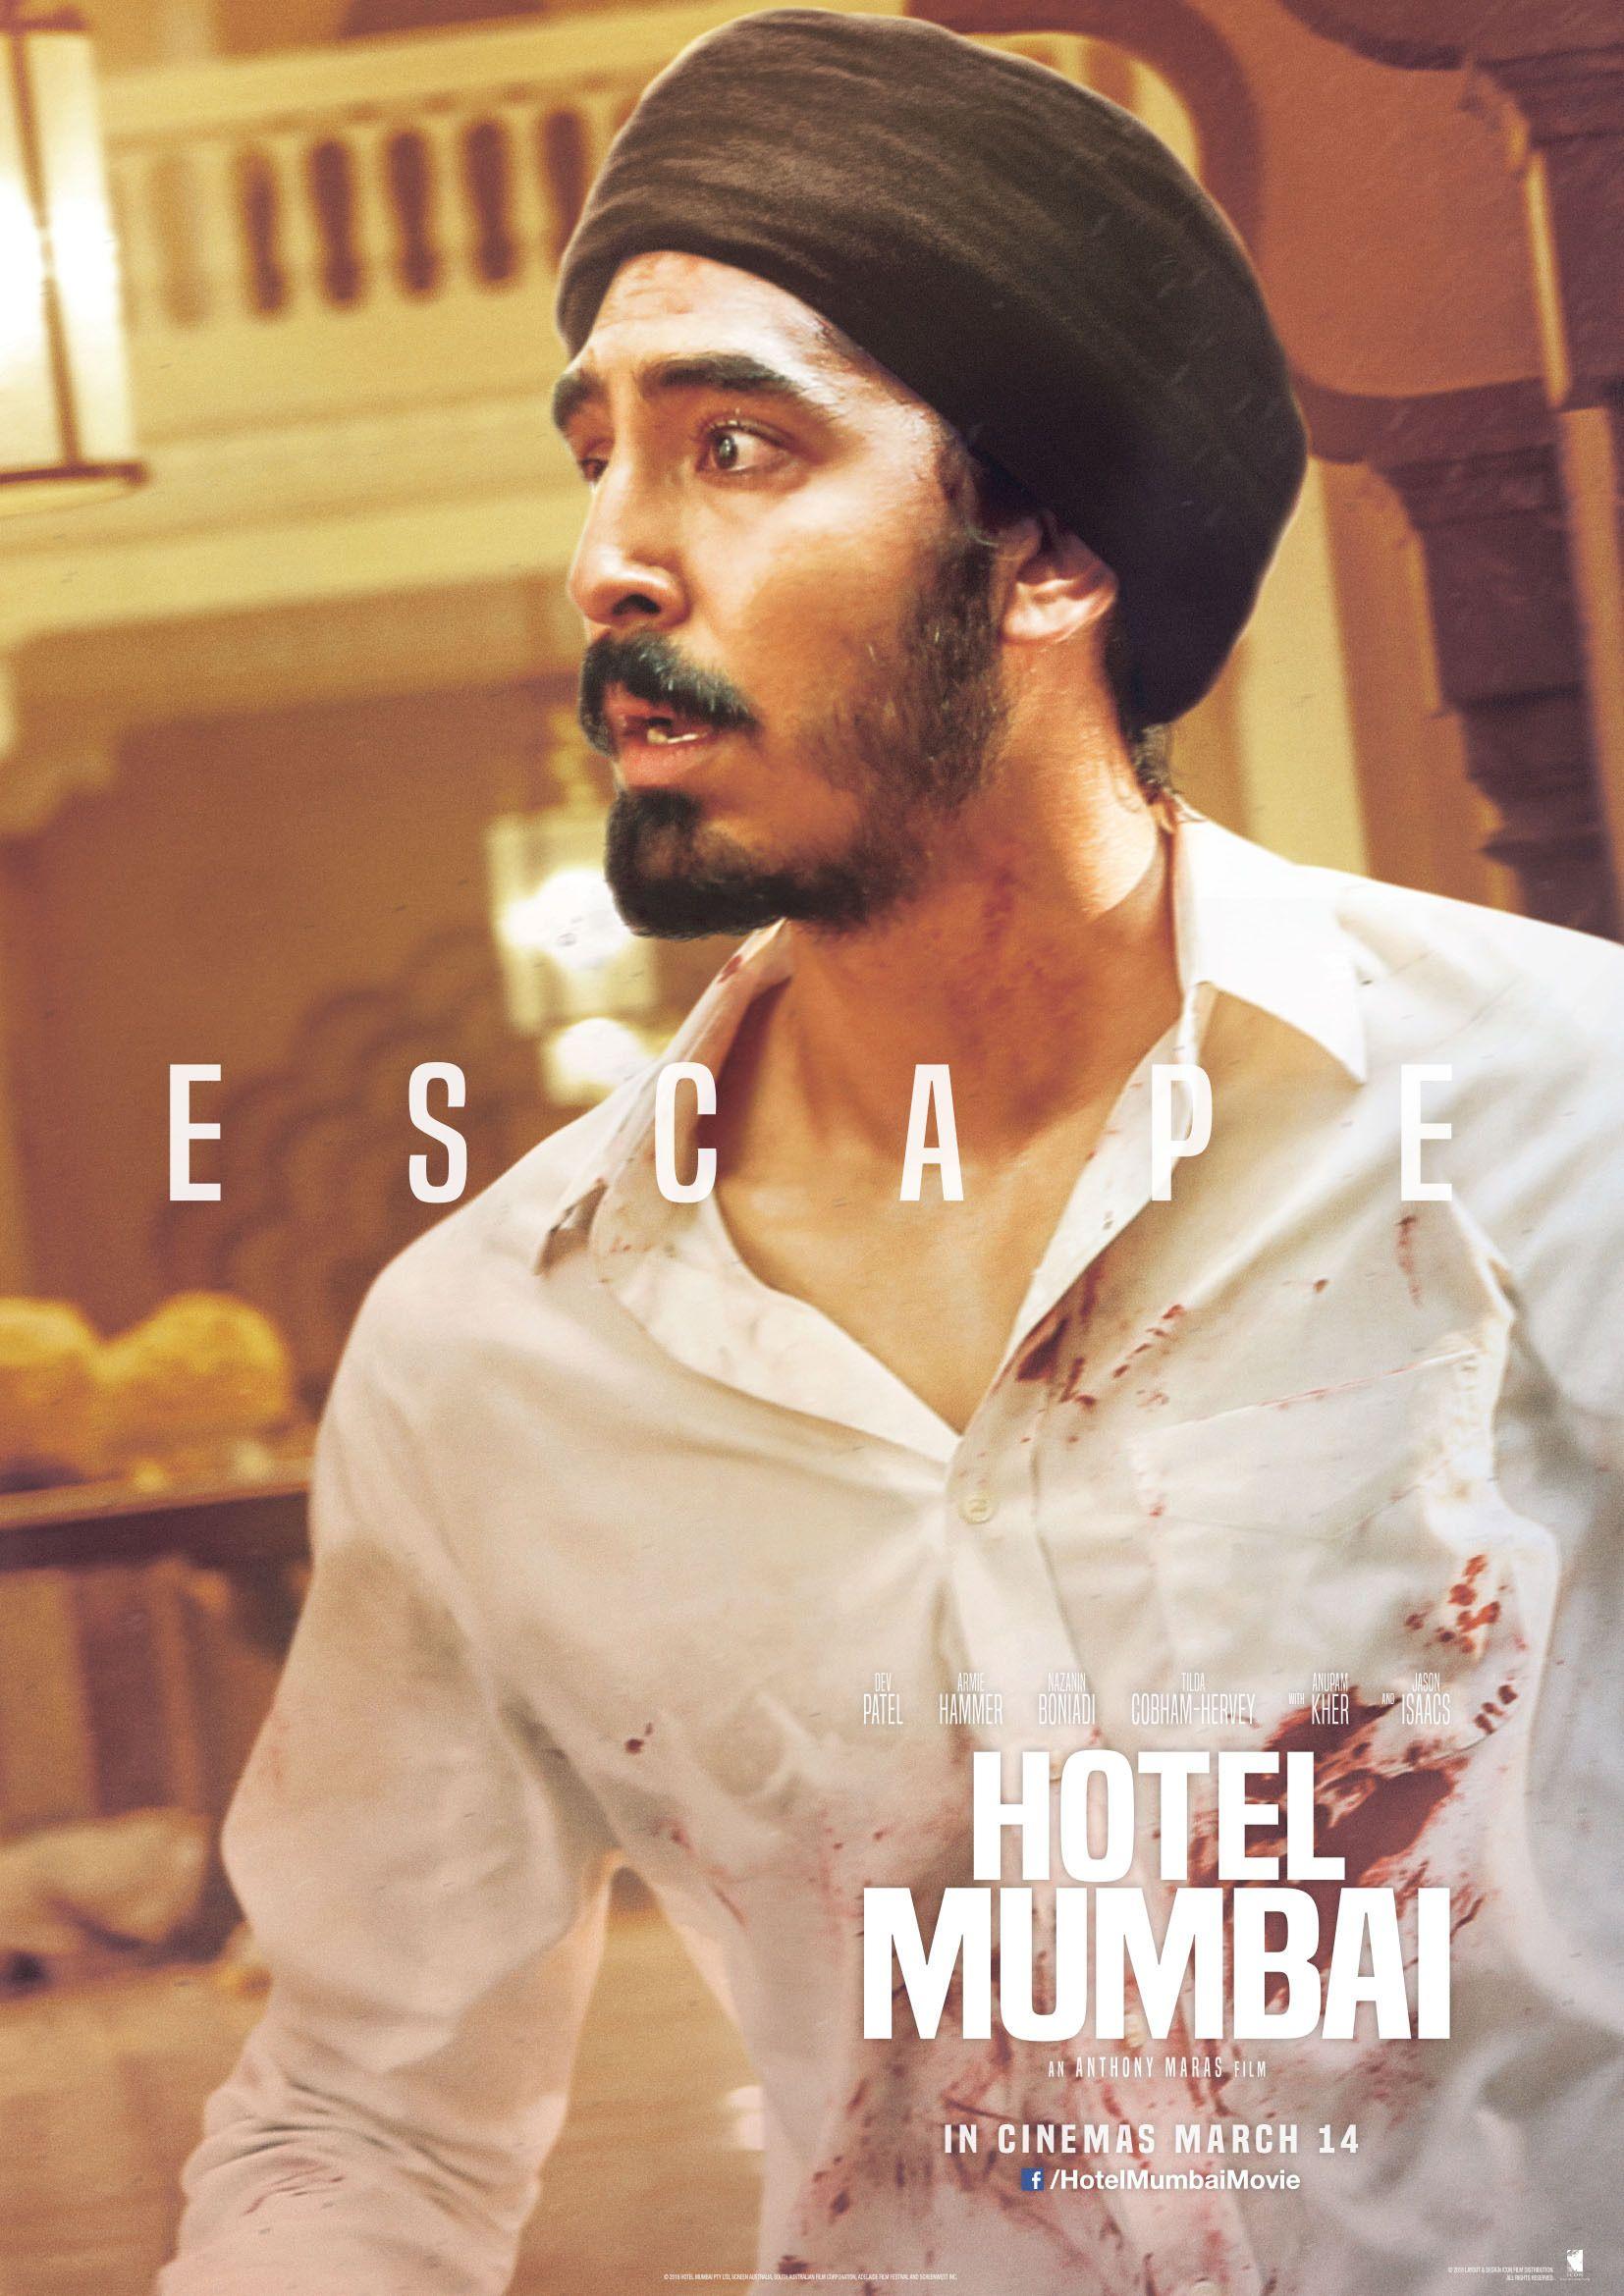 Hotel Mumbai (2018) Filmes completos, Filmes, Online gratis